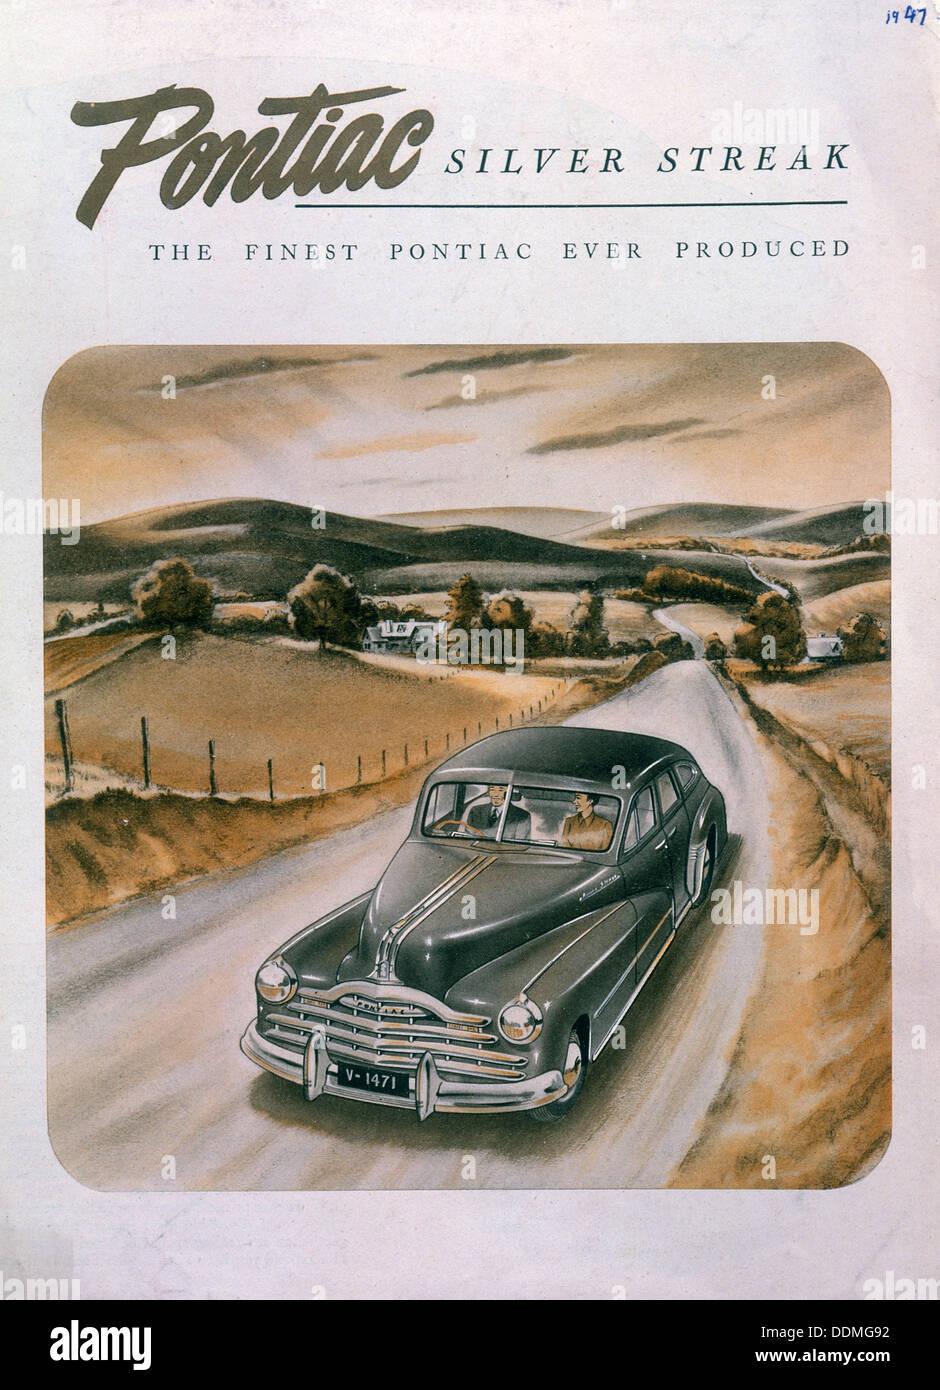 Pontiac Silver Streak Stock Photos 1941 Coupe Poster Advertising A 1947 Image